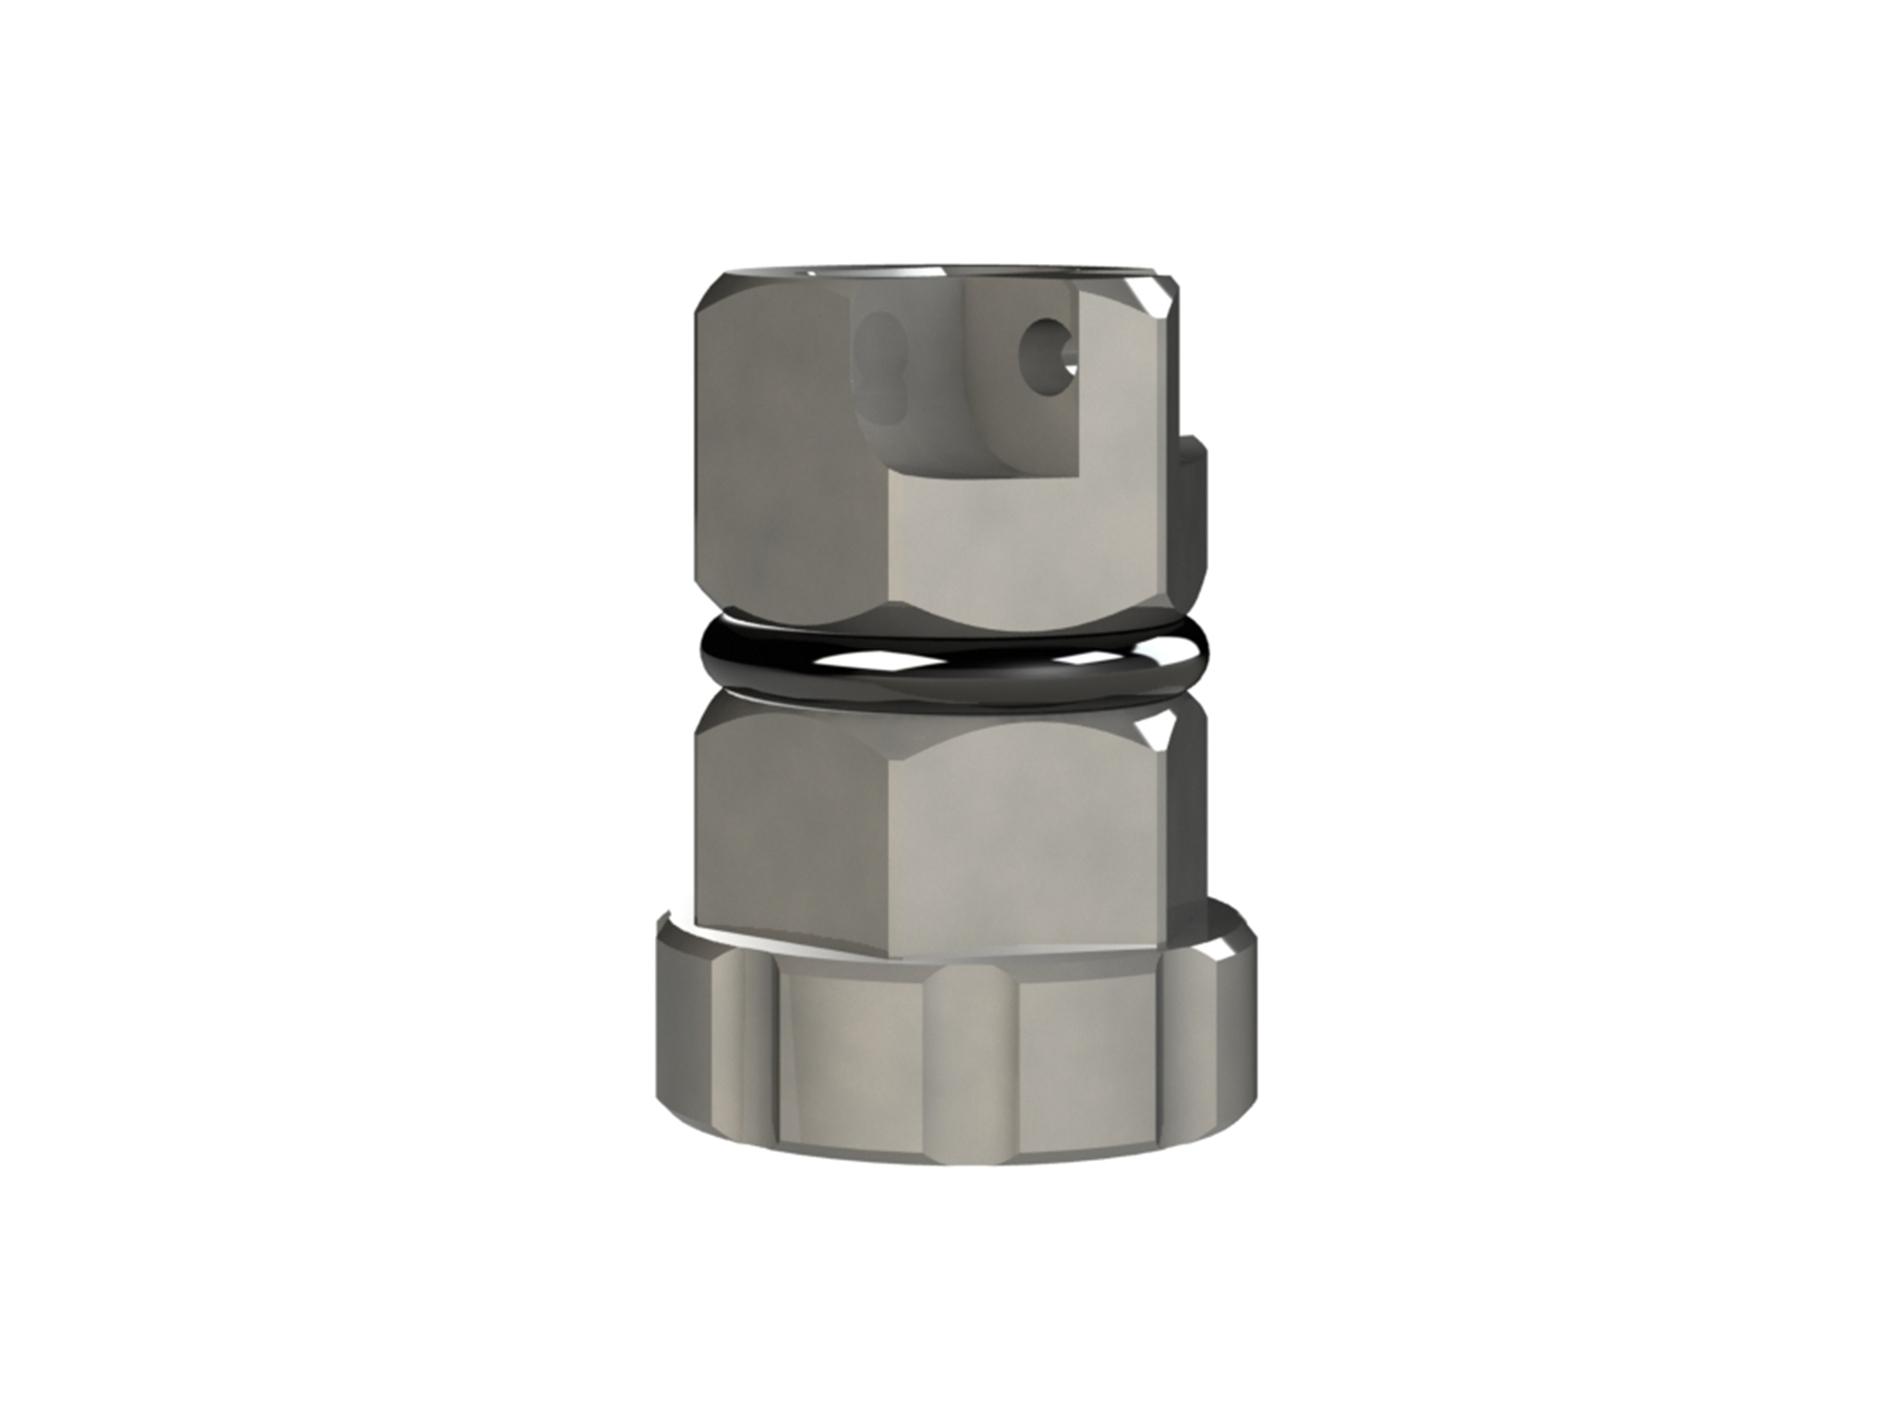 Universal-Ratsche ( Ohne Drehmomentfunktion )   Art.-Nr. 31.037.54.095  Anschluss SW 6,4 mm  Länge 54 mm  Preis  75€